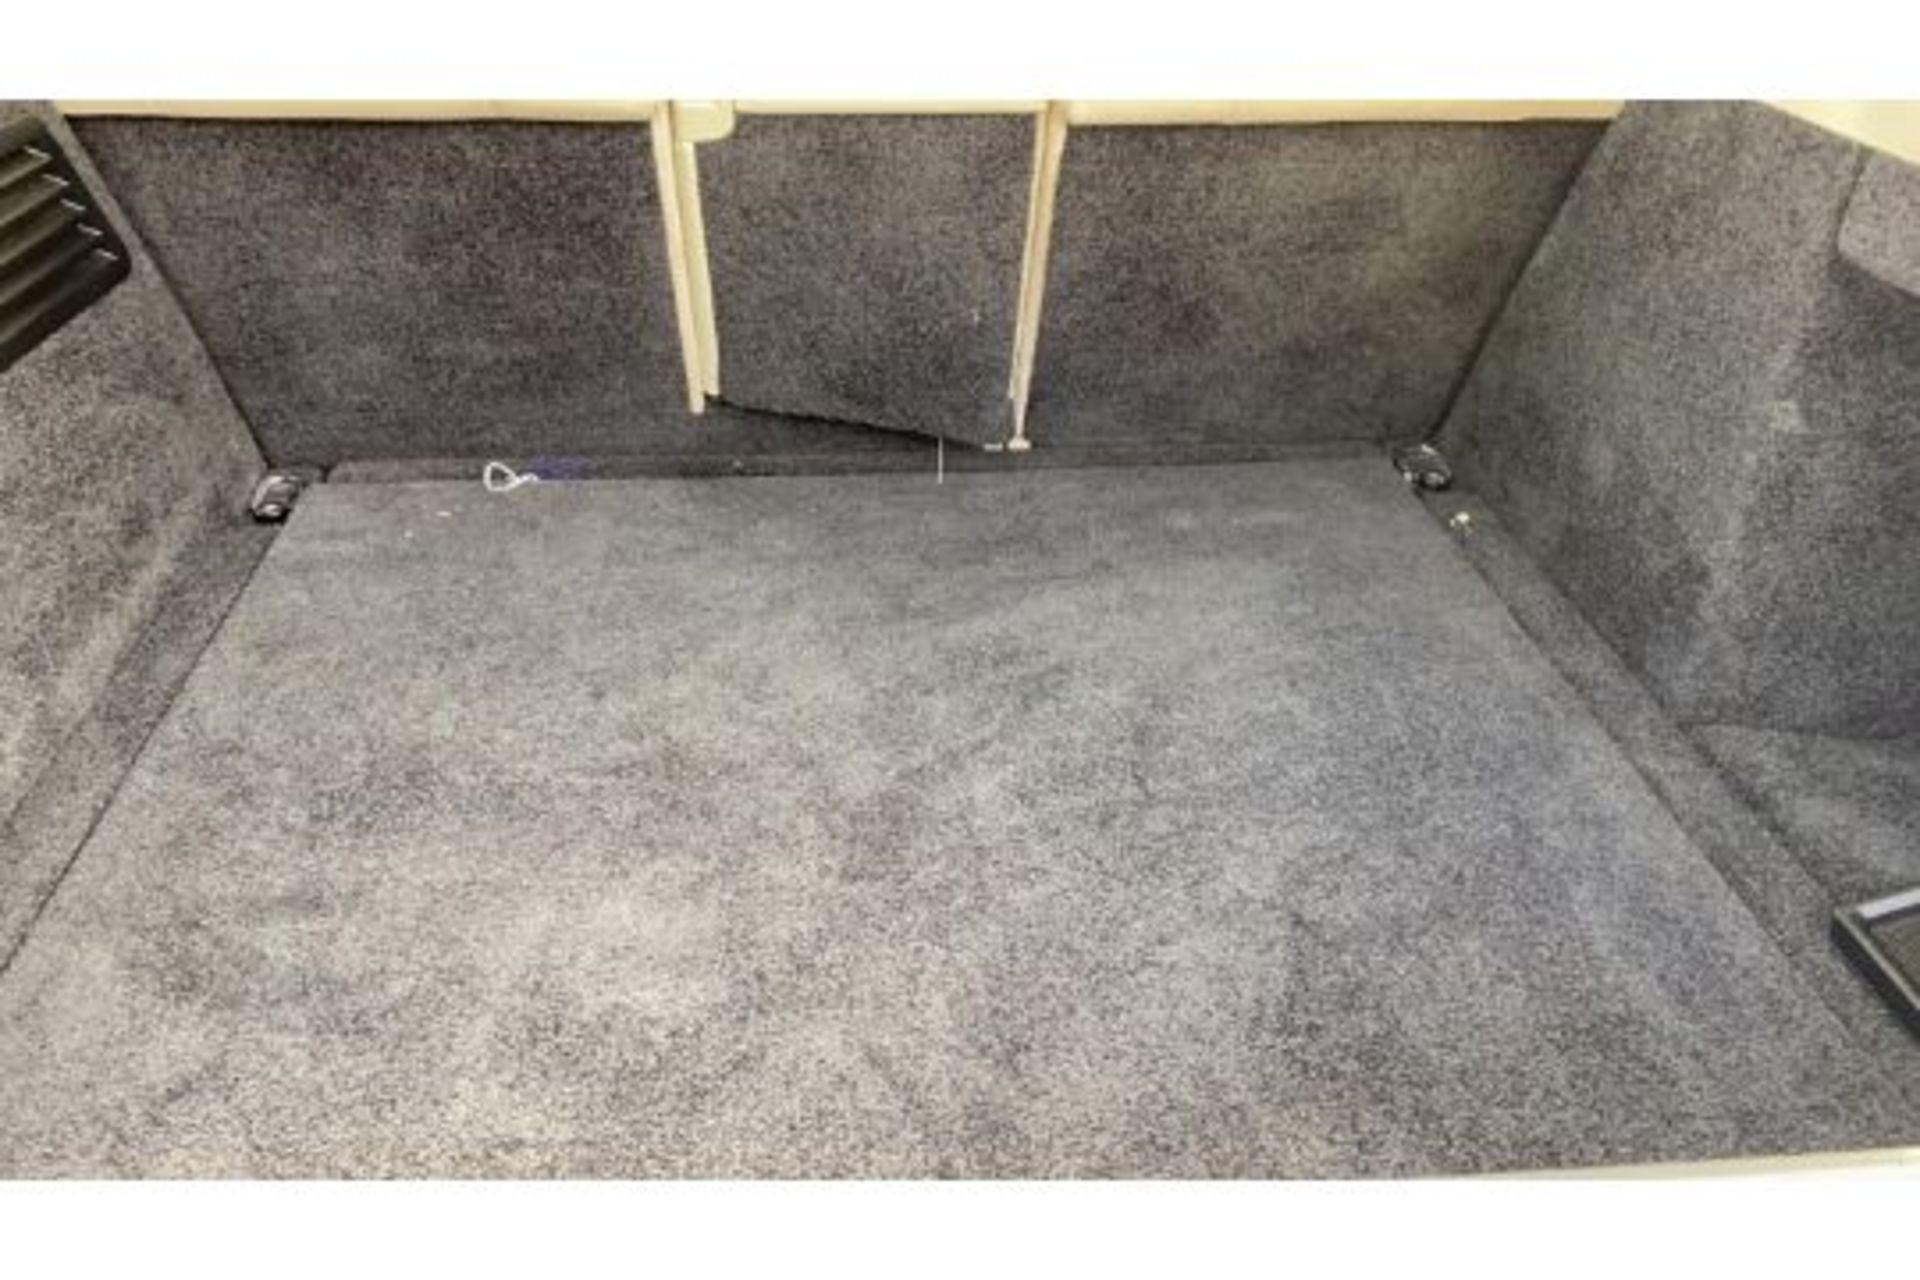 Range Rover Vogue 3.0 TDV6 SE Auto - Black Pack - NEW SHAPE - FULLY LOADED - Pan Roof - Image 27 of 30